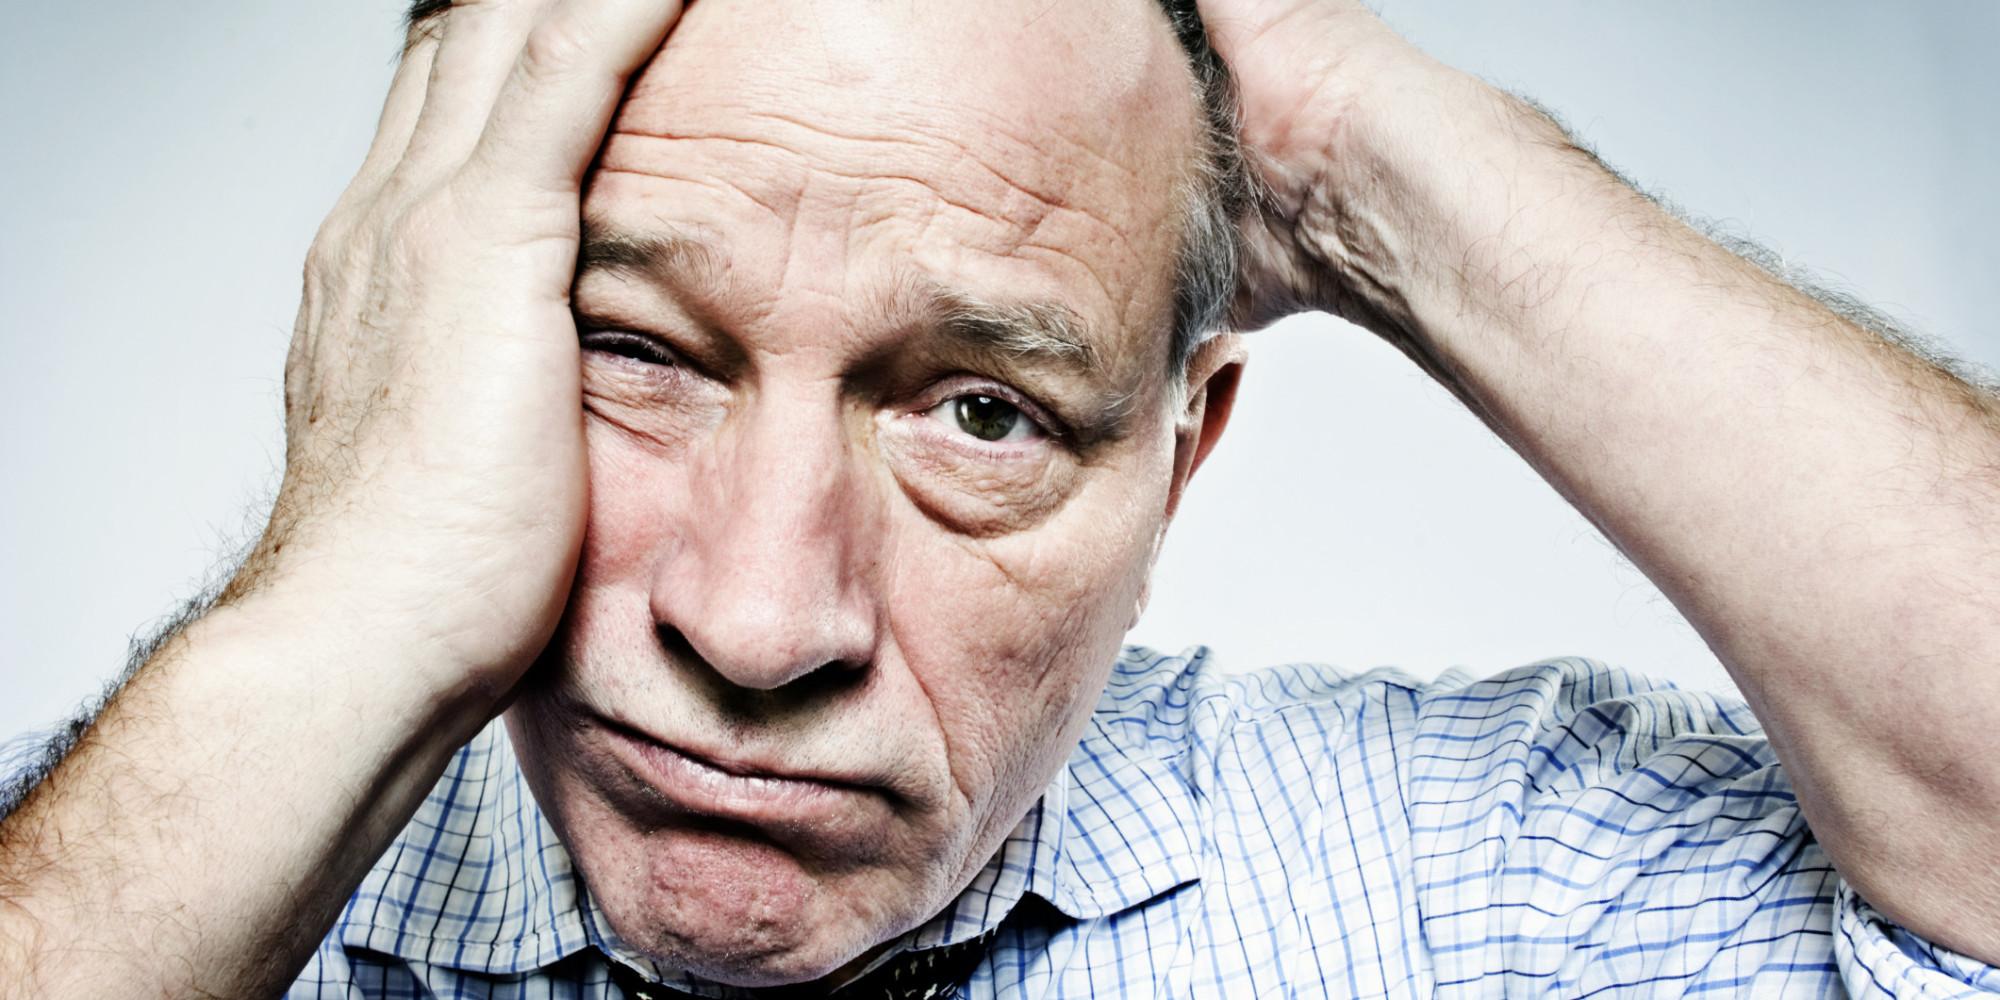 prostatecancerdepression.jpg